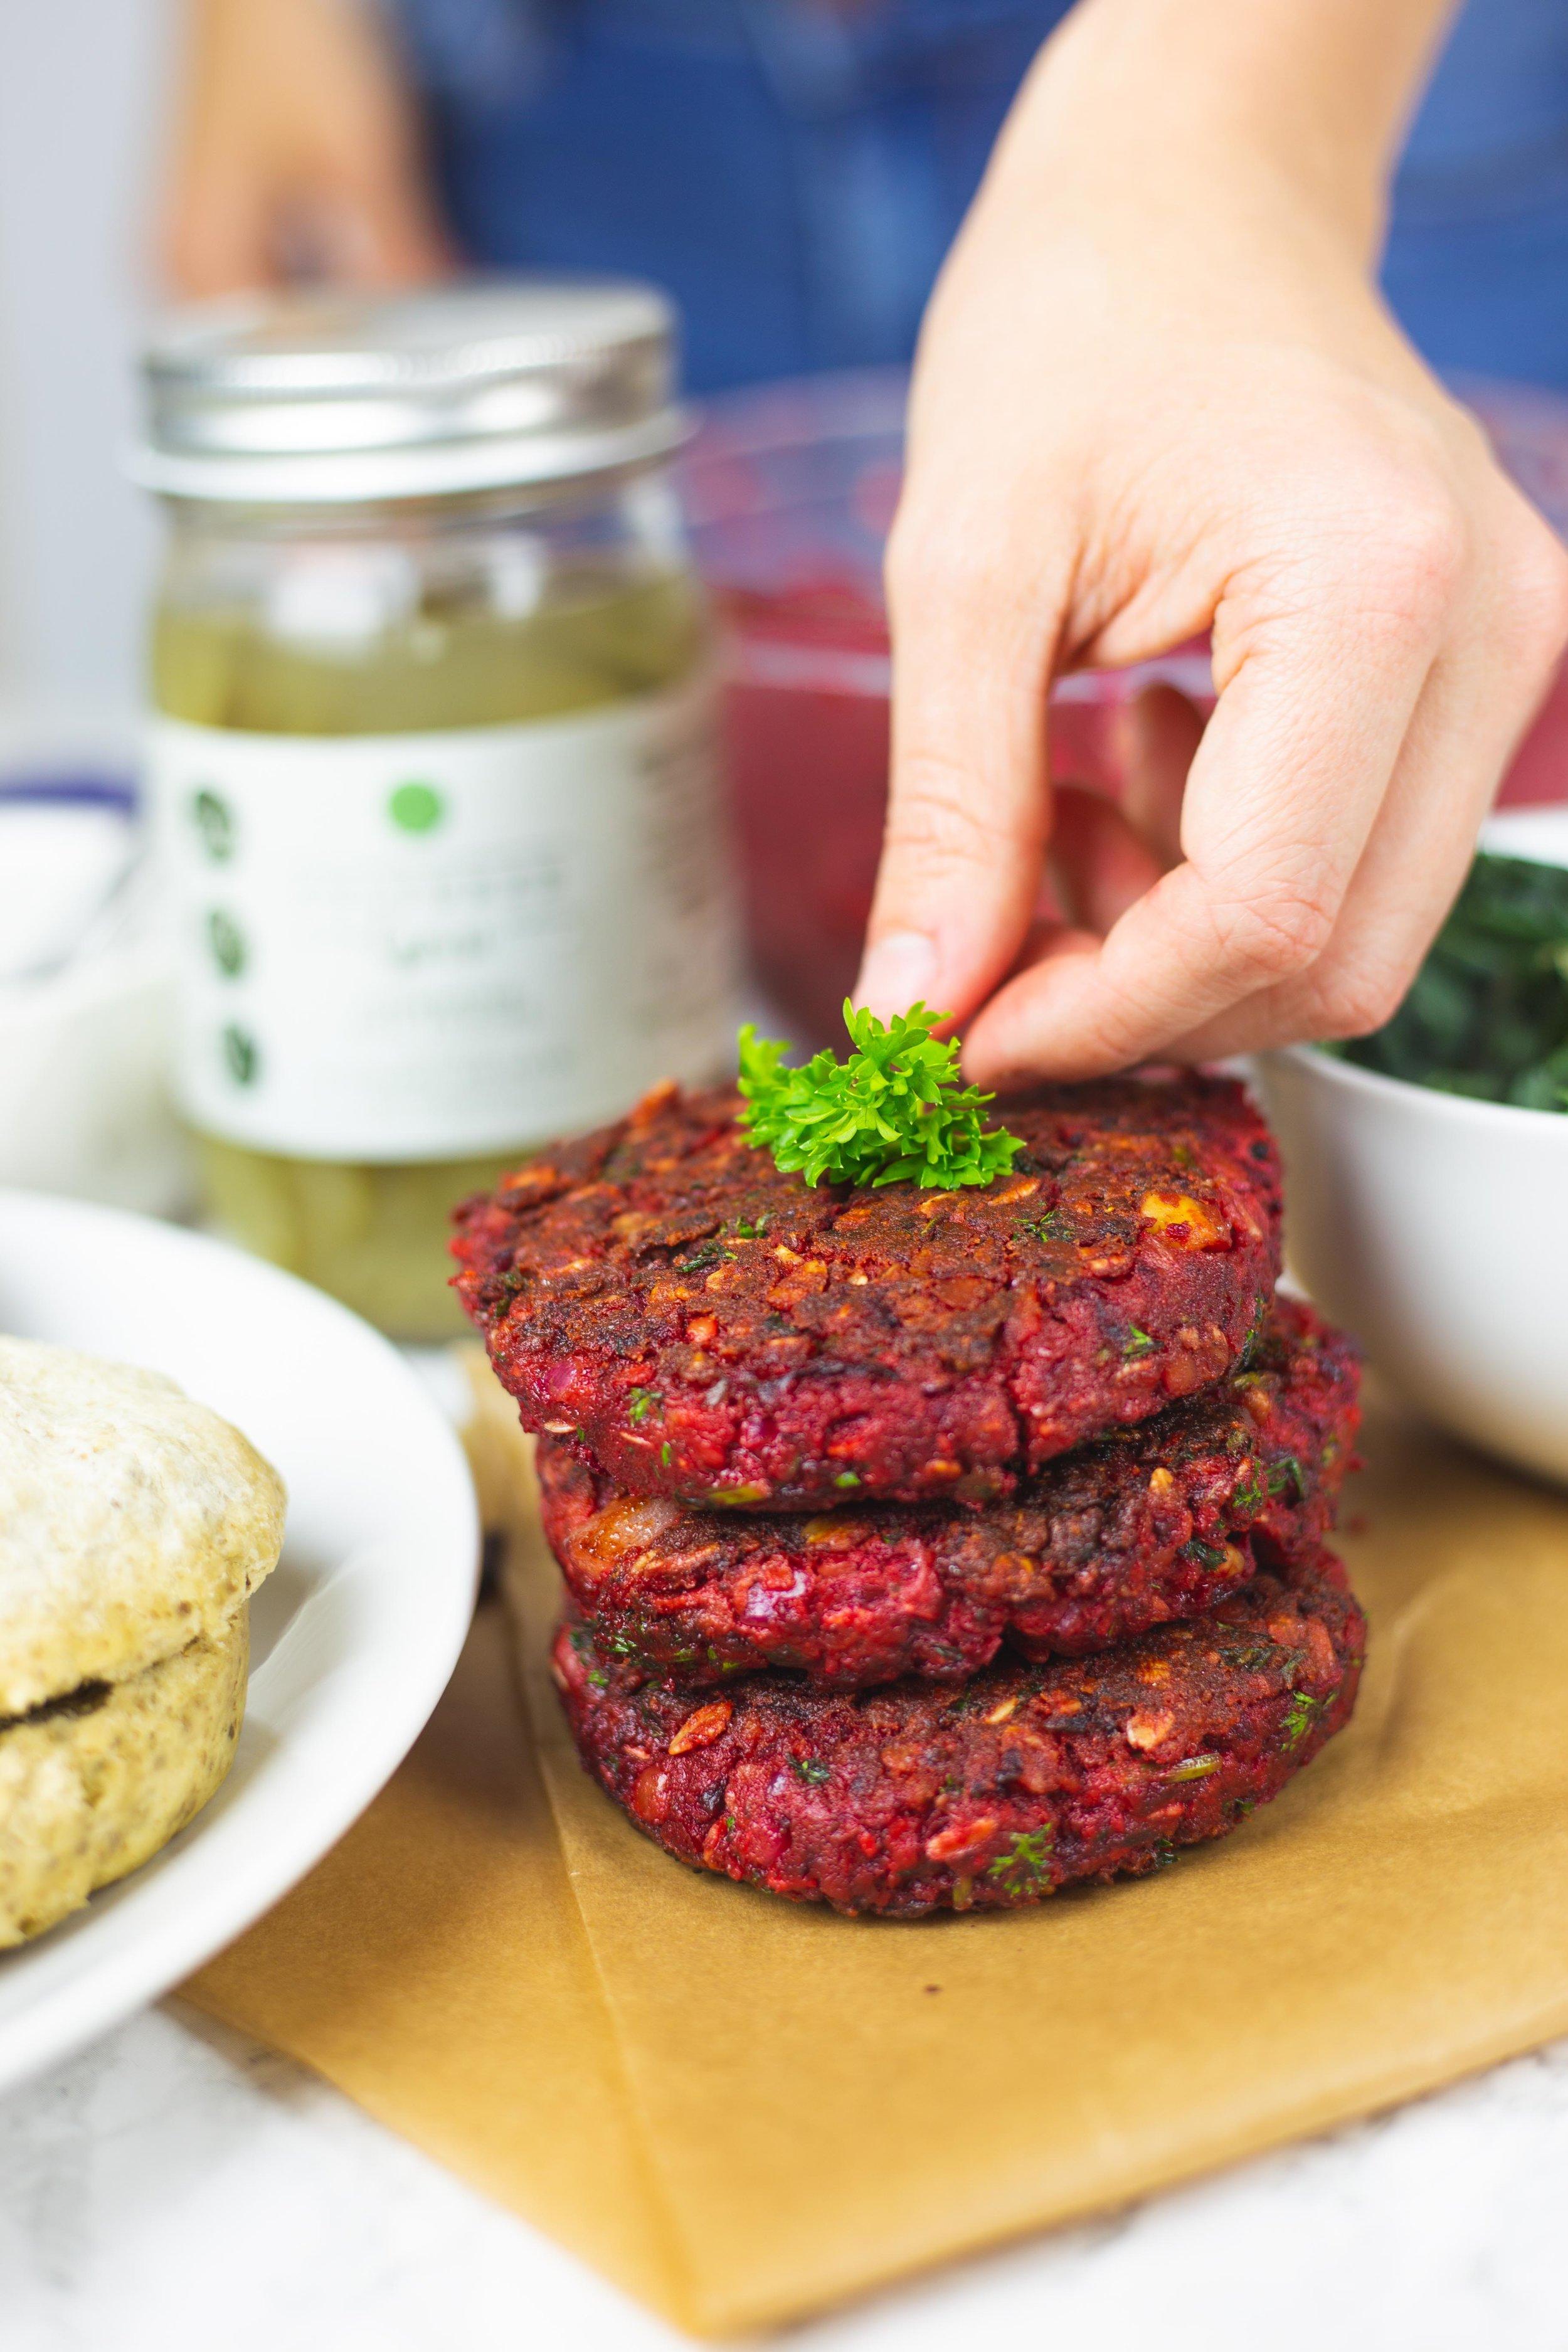 The Ultimate Beet Veggie Burger | Vegan Beet Burger Recipe | Grillable Veggie Burgers with Fermented Pickles